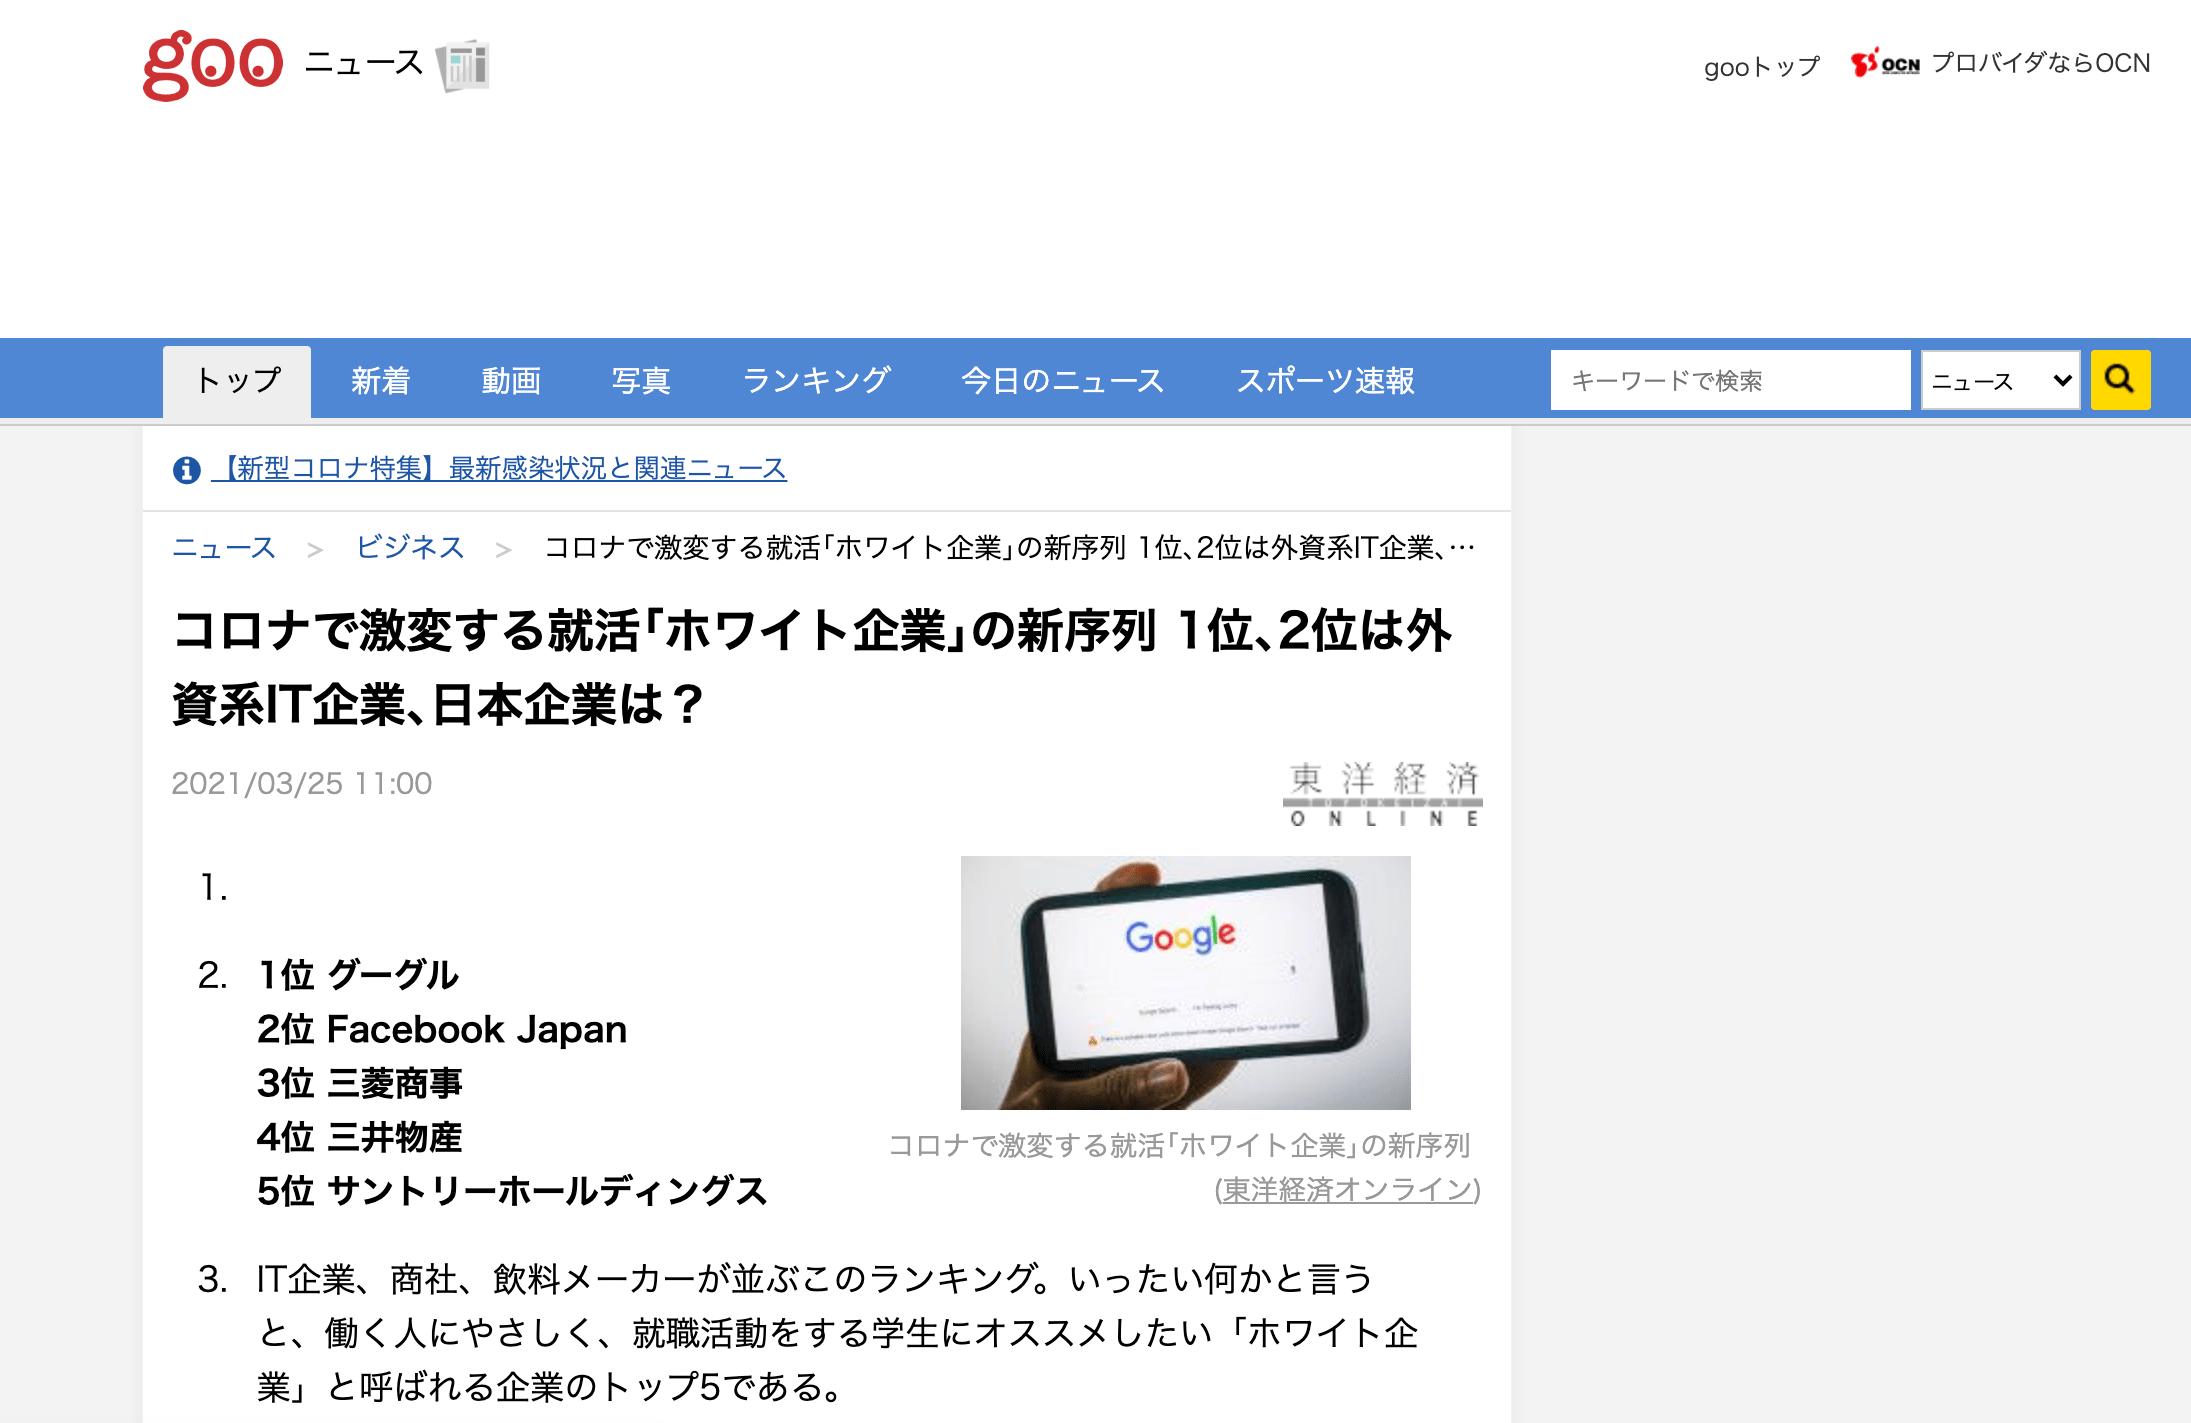 gooニュースでの紹介記事